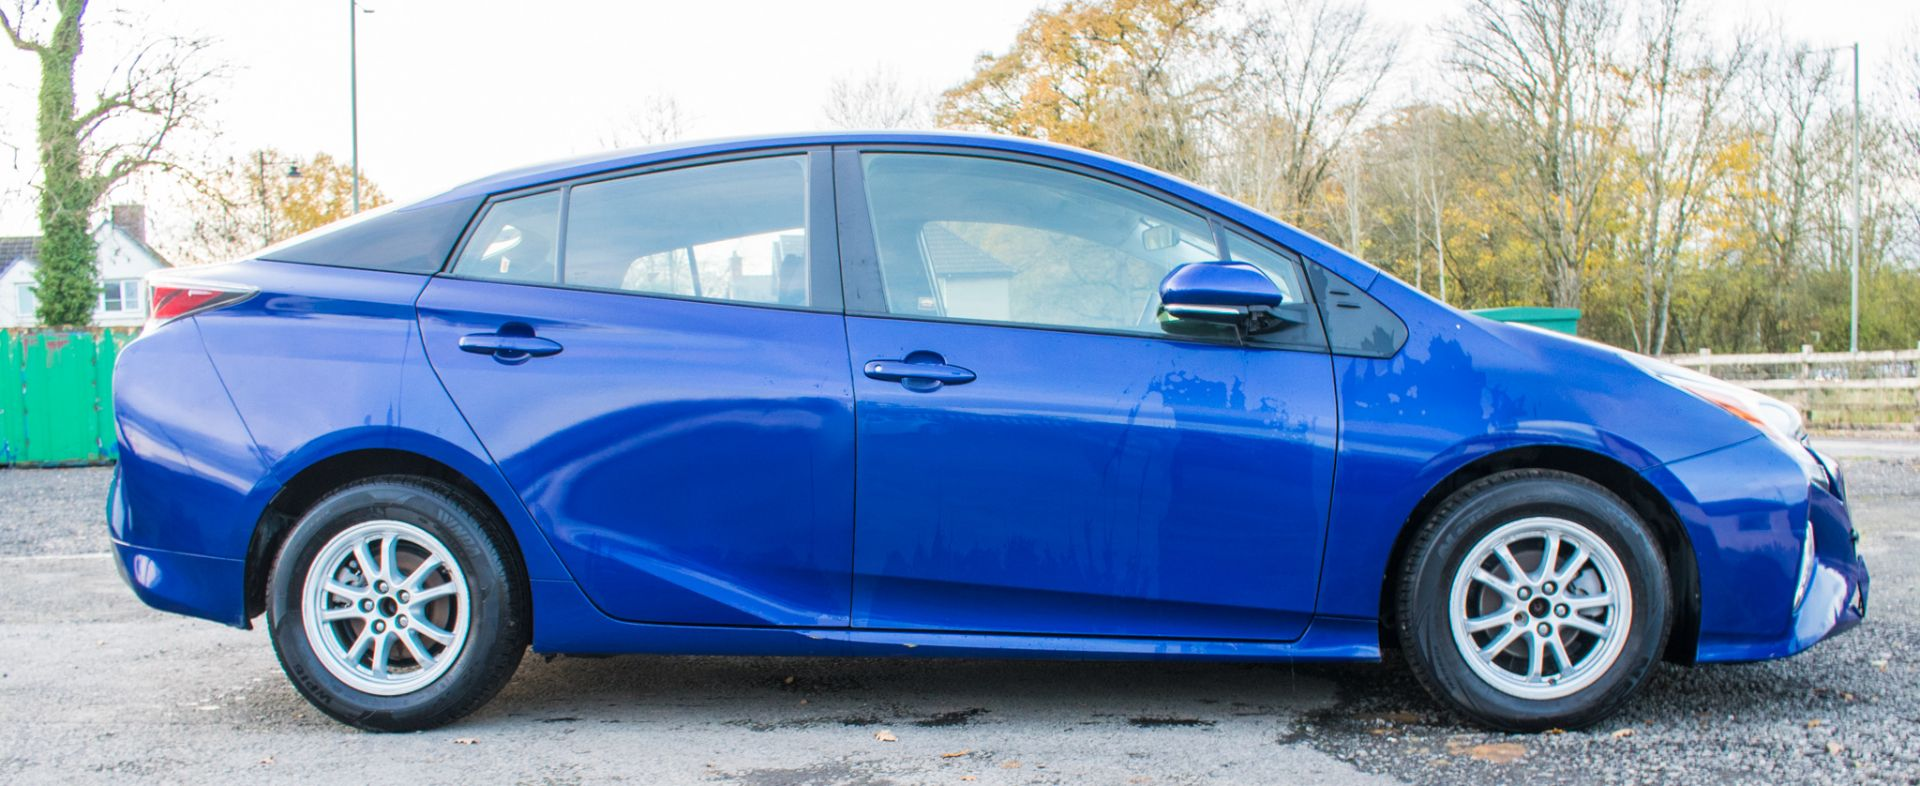 ToyotaPrius ActiveHybrid Electric 5 doorHatchback  Registration Number: LM67 OKH Date of First - Image 7 of 17